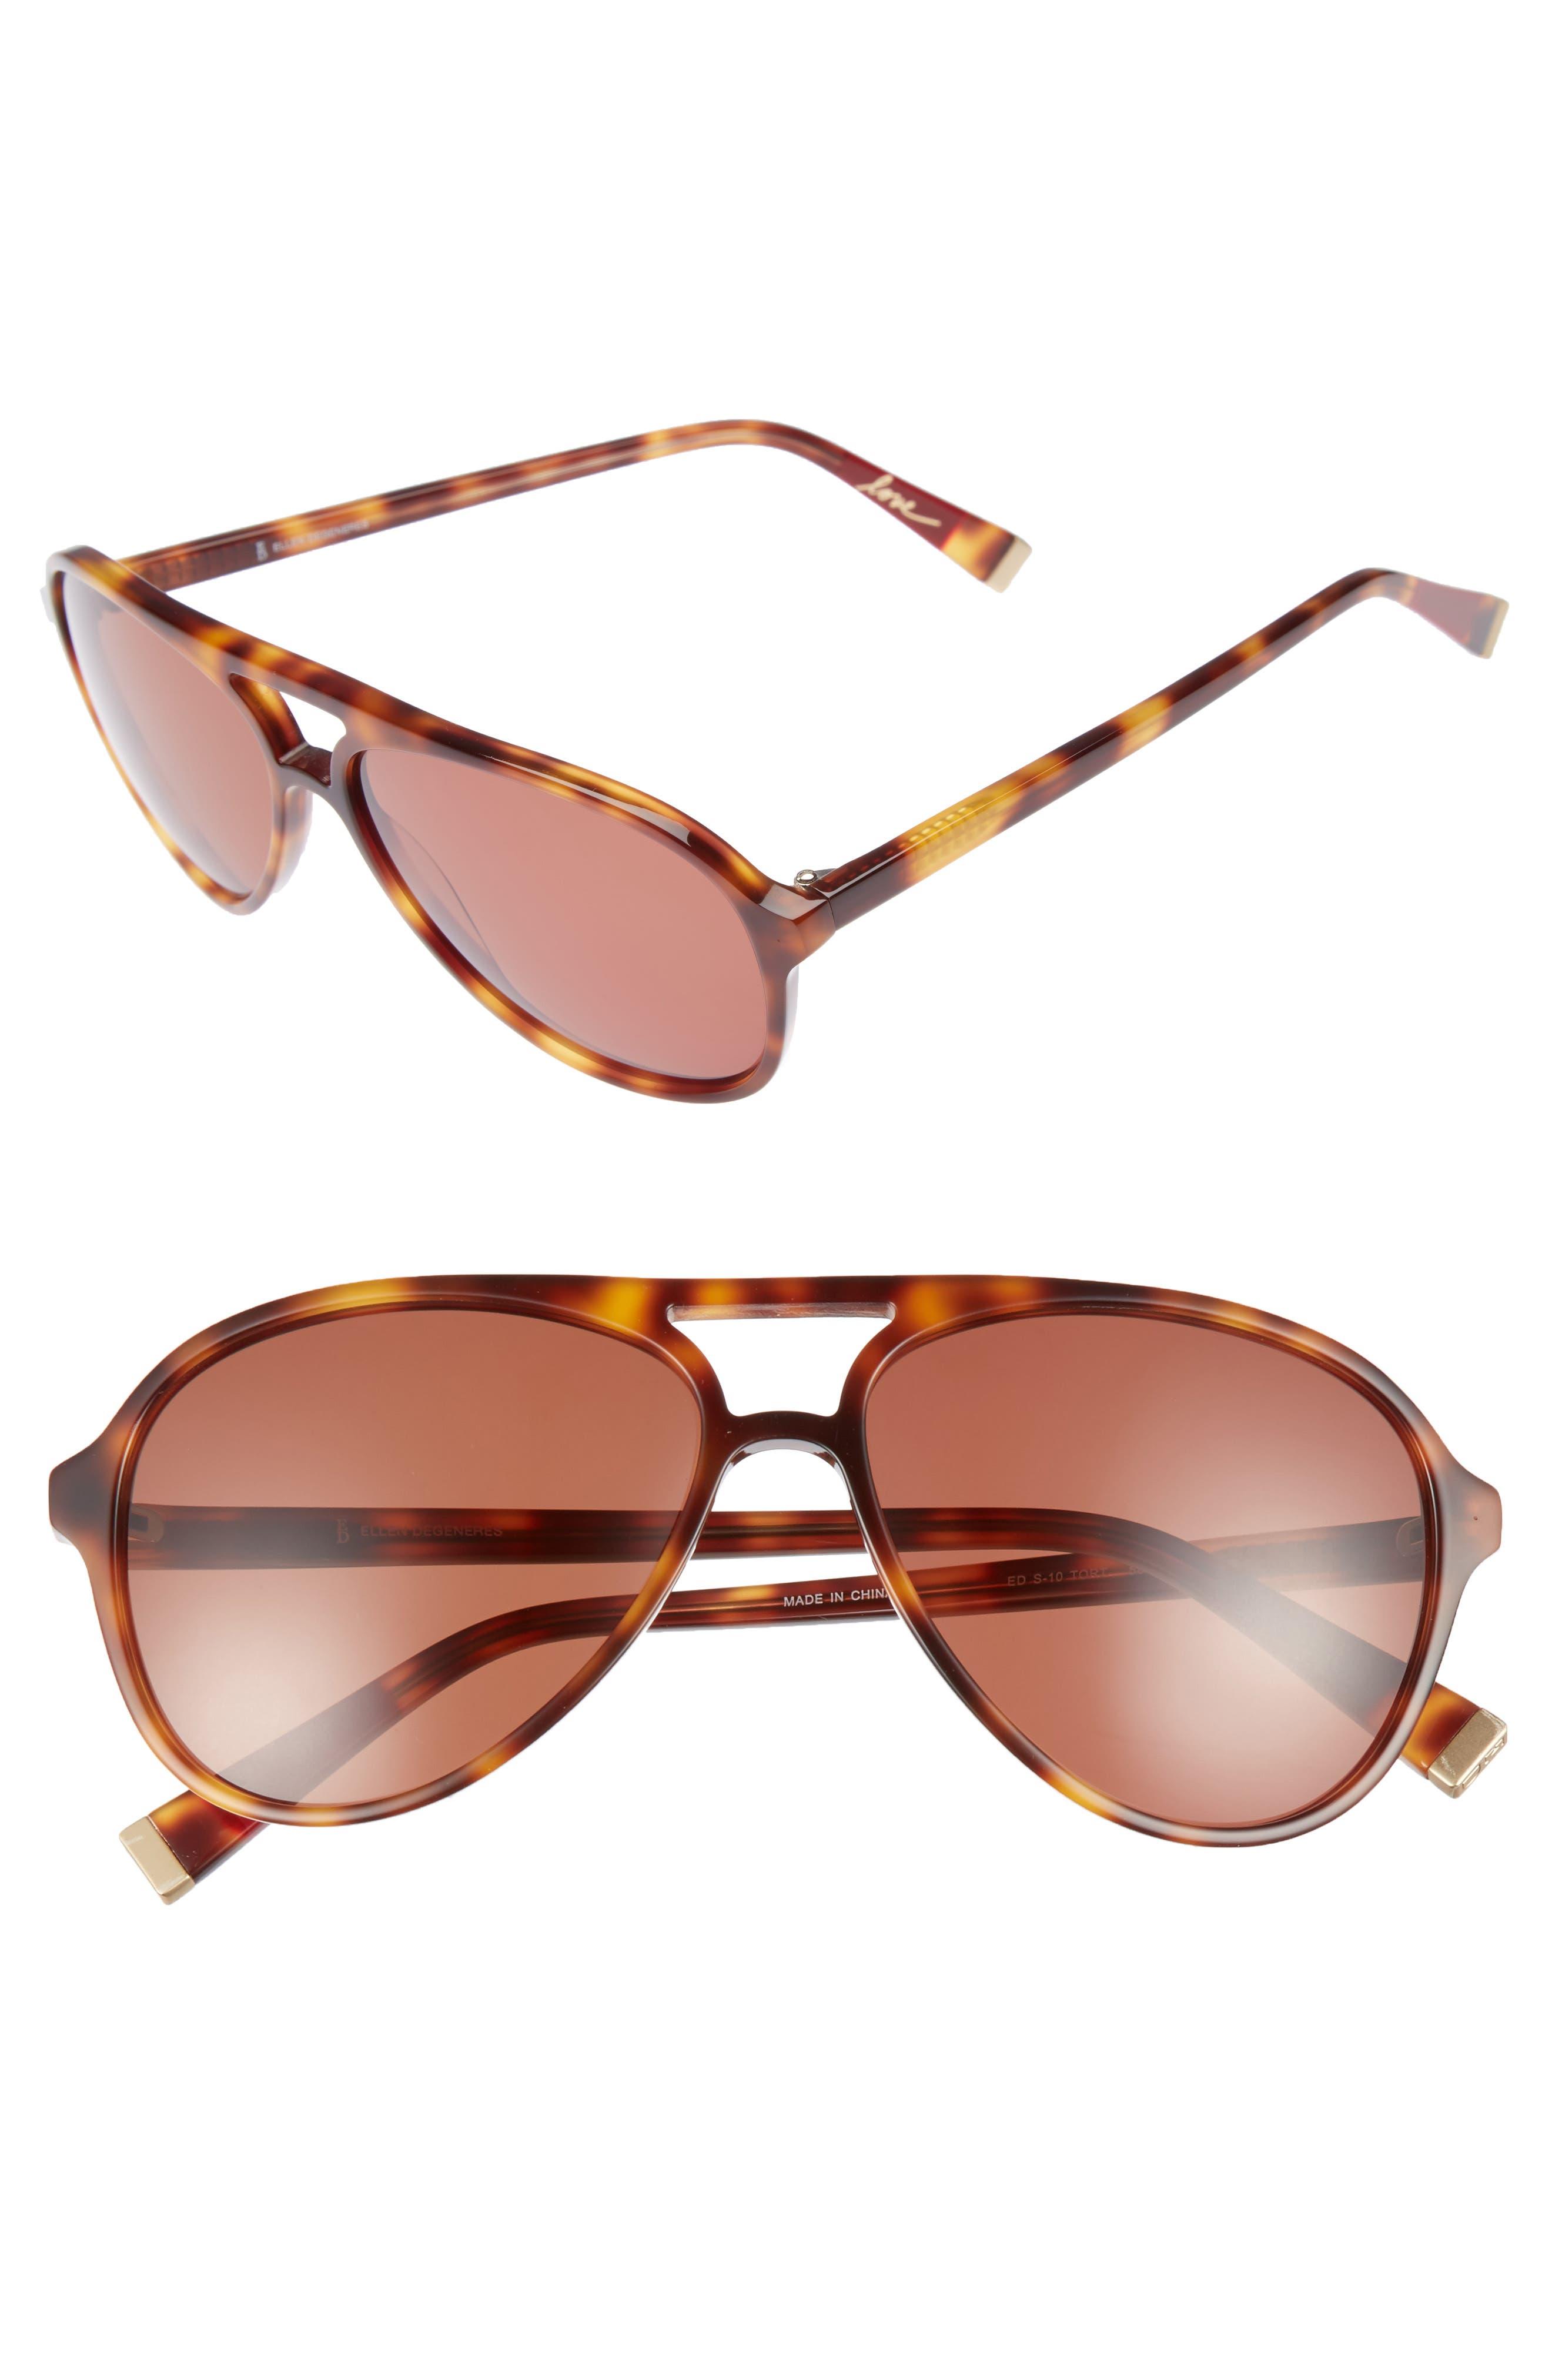 58mm Gradient Aviator Sunglasses,                         Main,                         color, TORTOISE